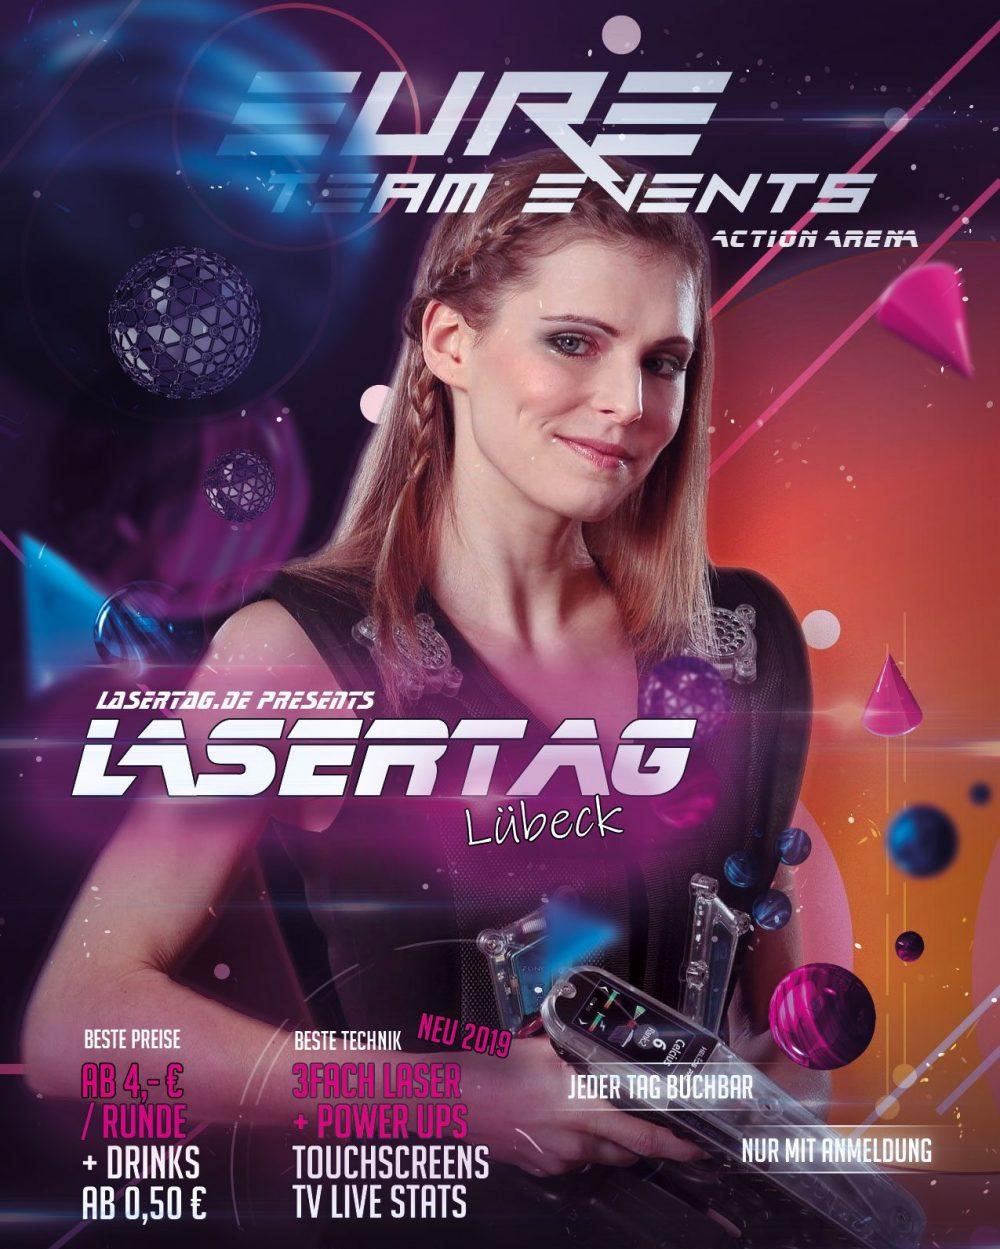 LasertagLuebeckFlyer2019Front